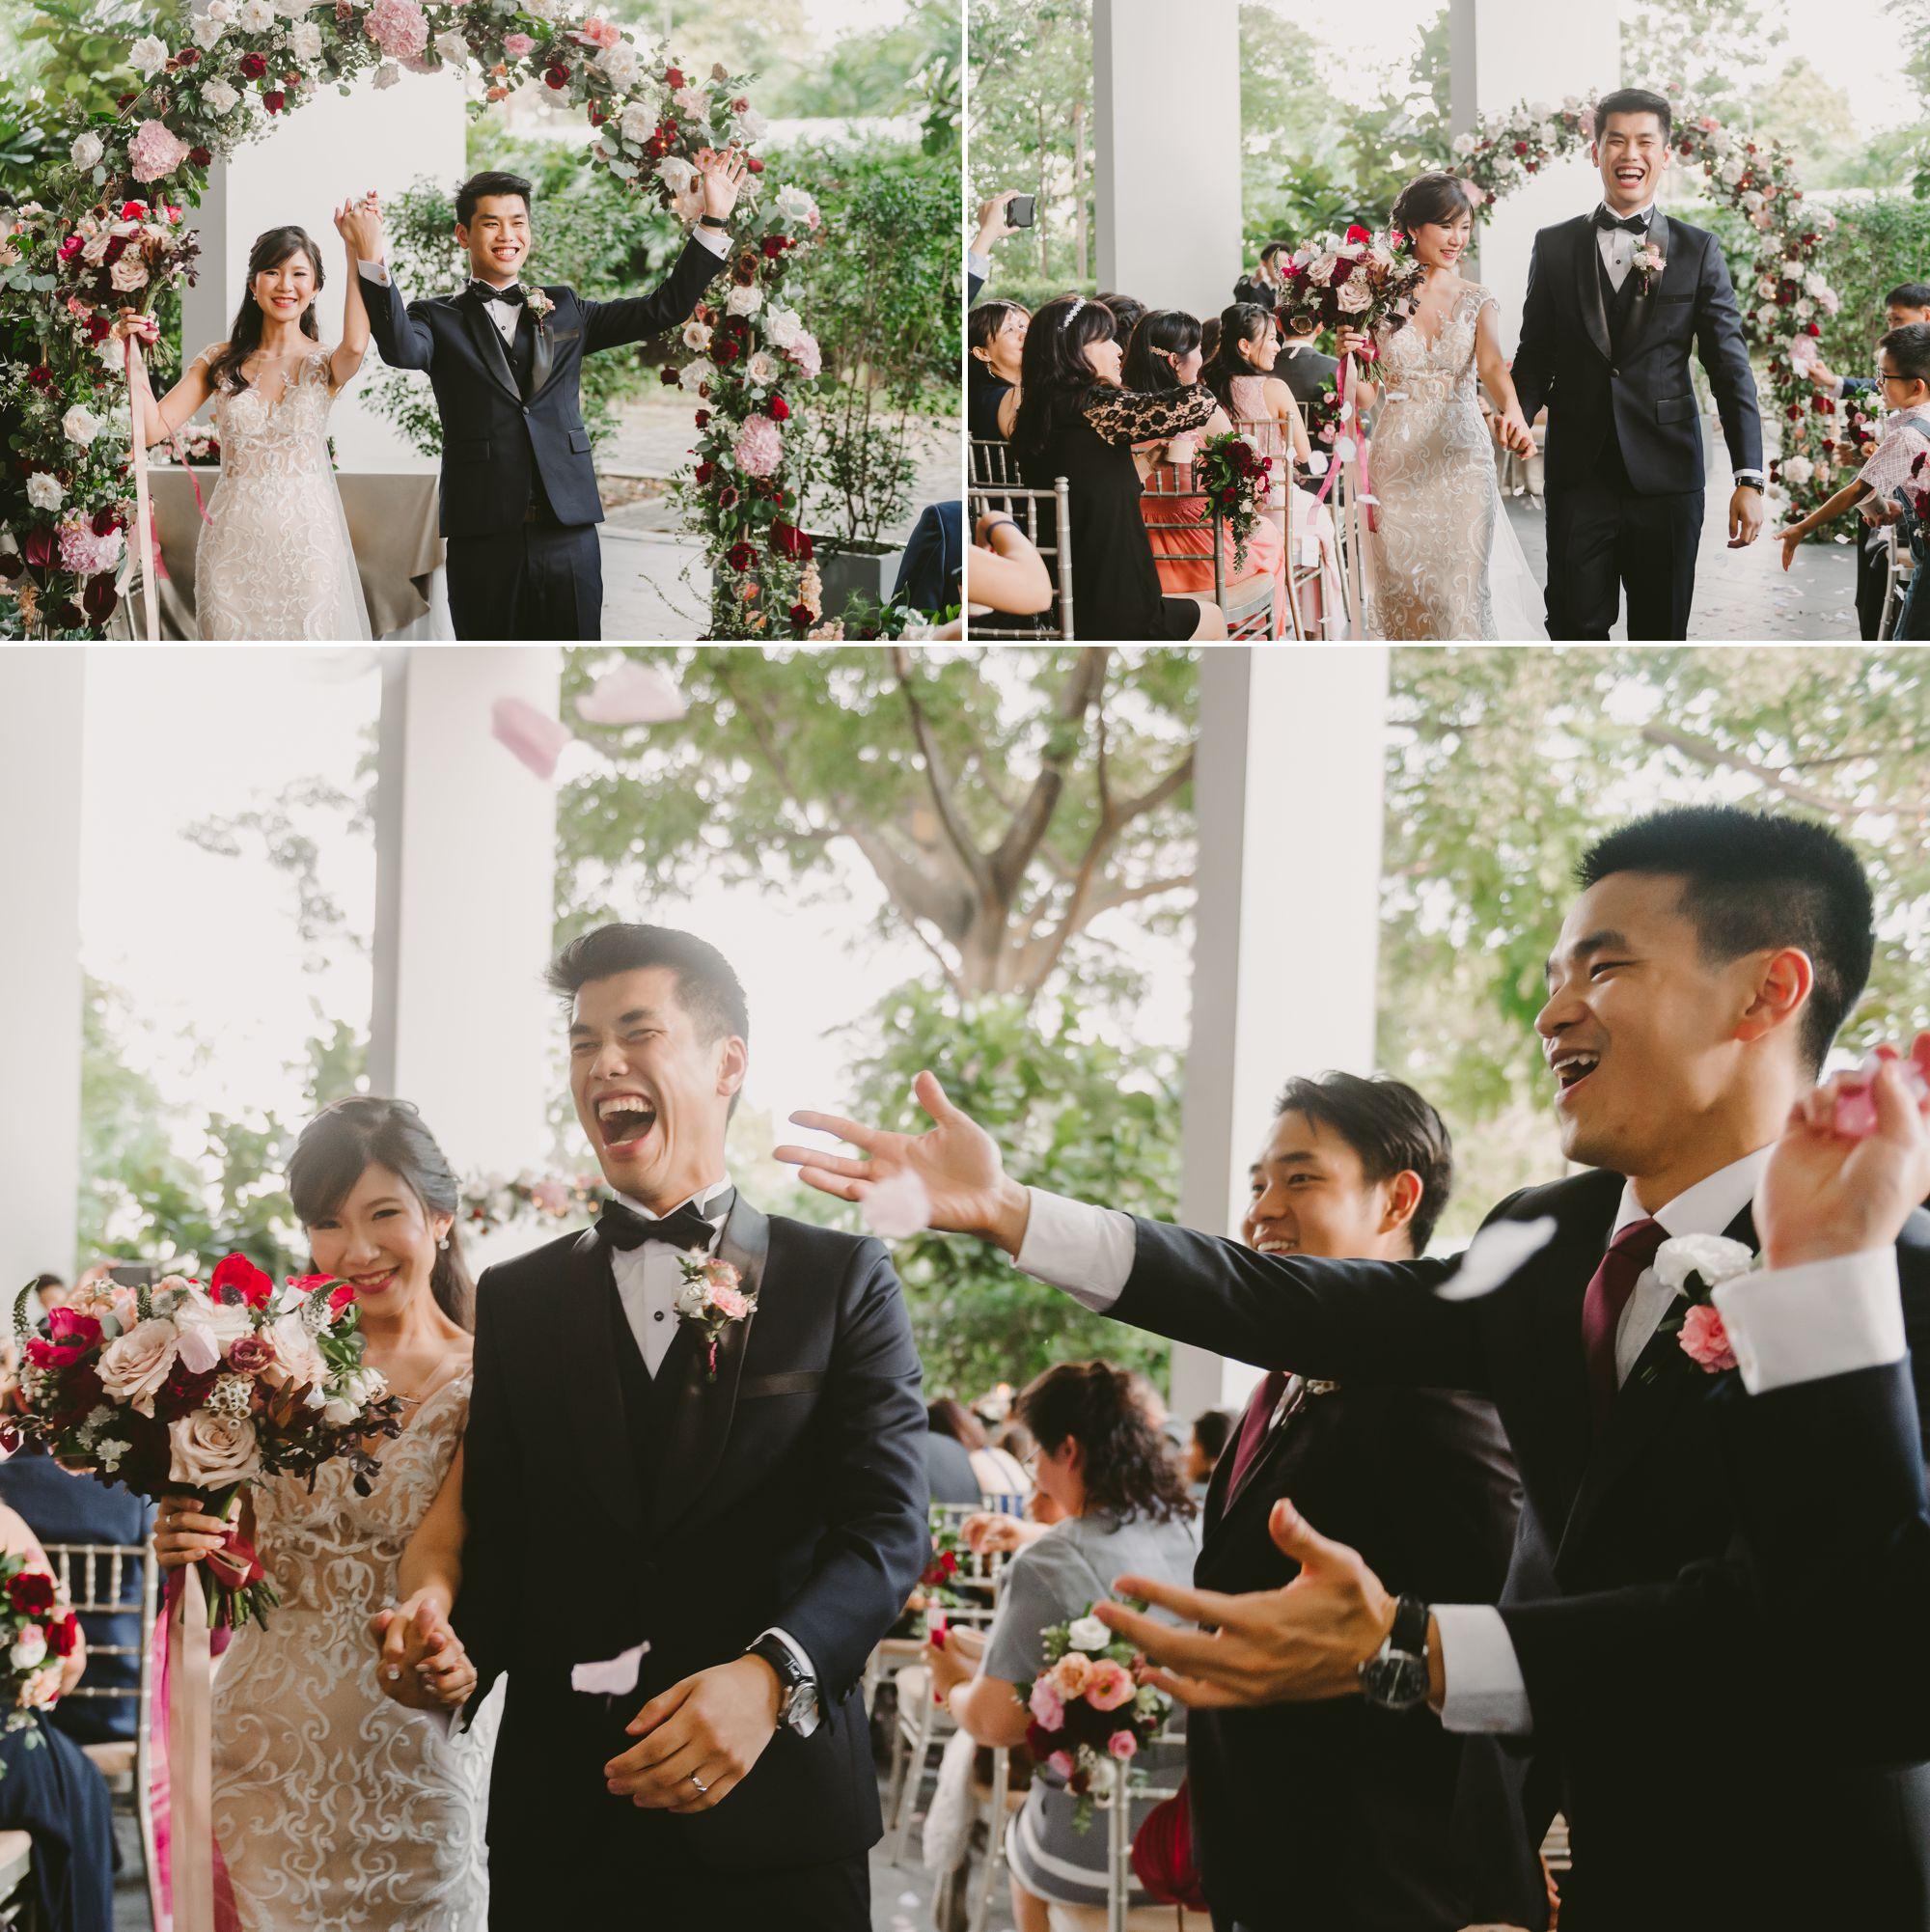 capella_wedding_photography_ 55.jpg